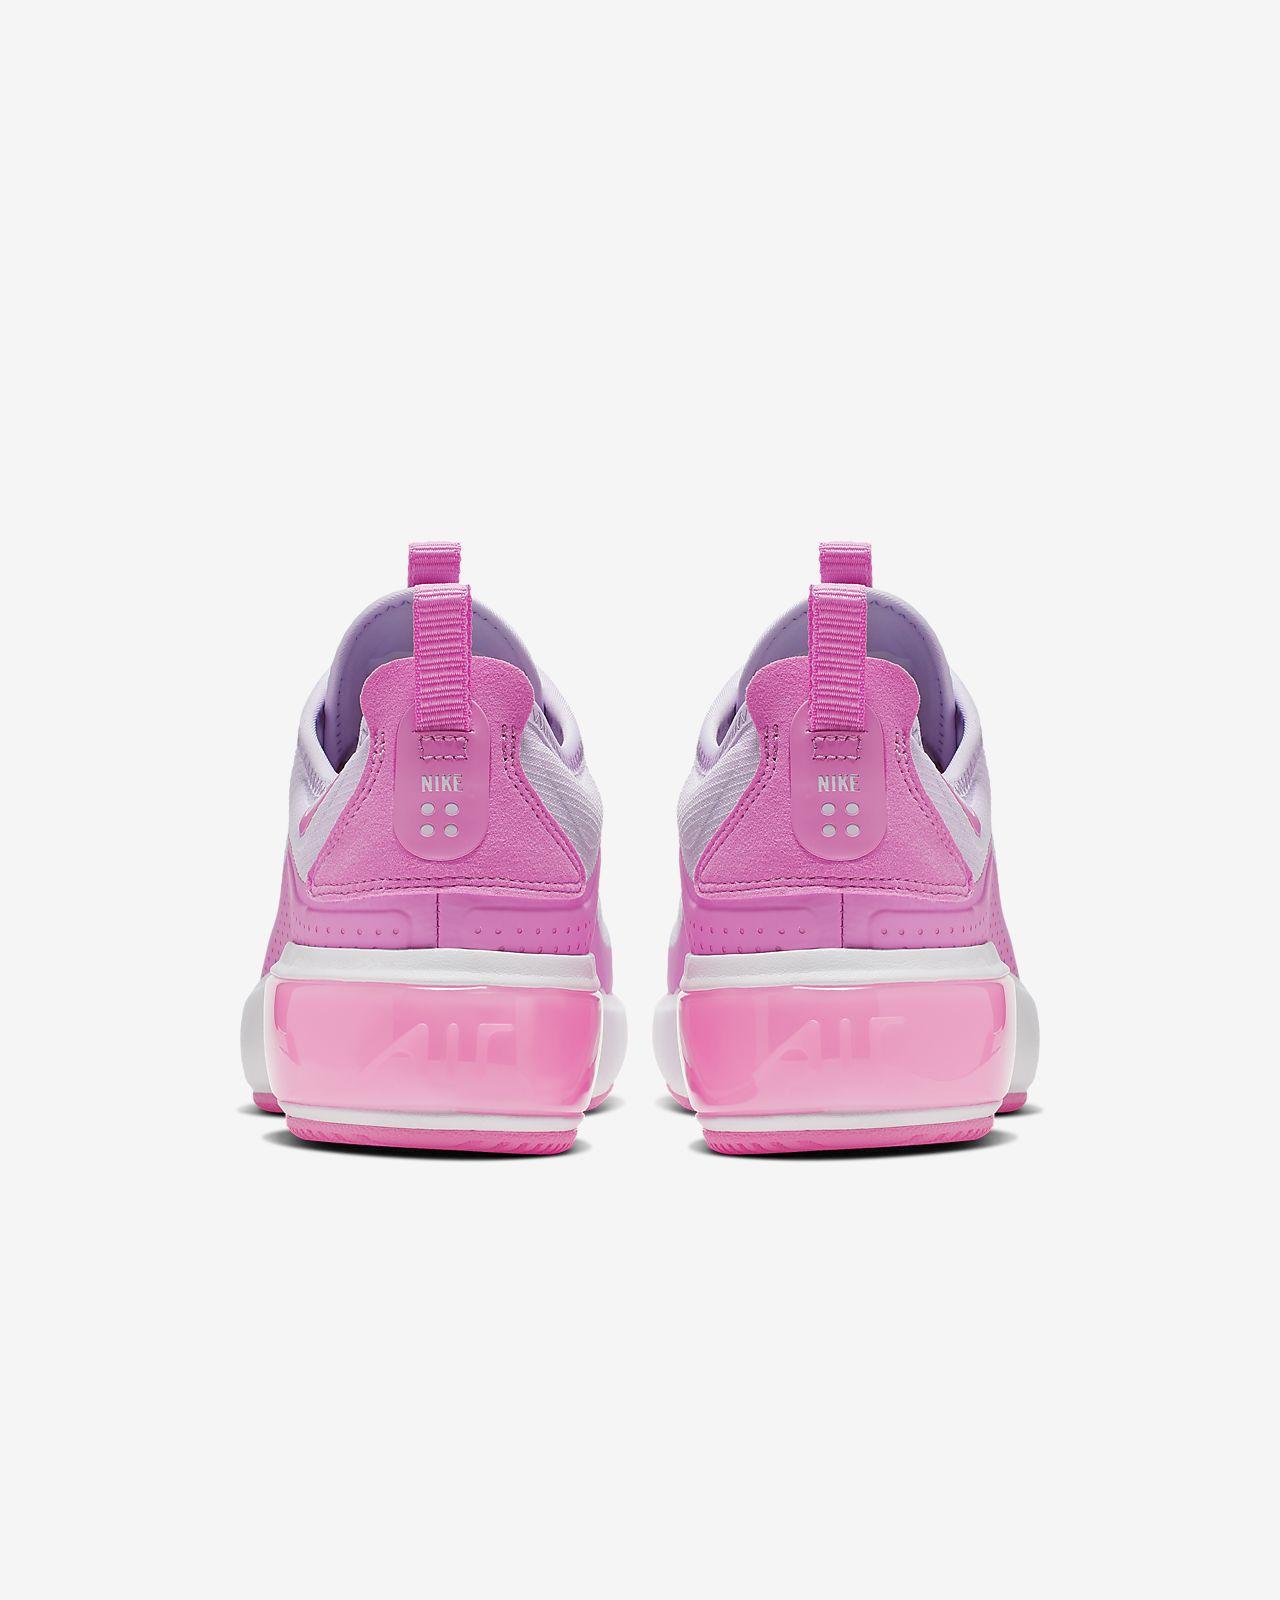 jeansjogging chaussures nike 2020 air max pas cher pour homme rainbow black   JeansJogging